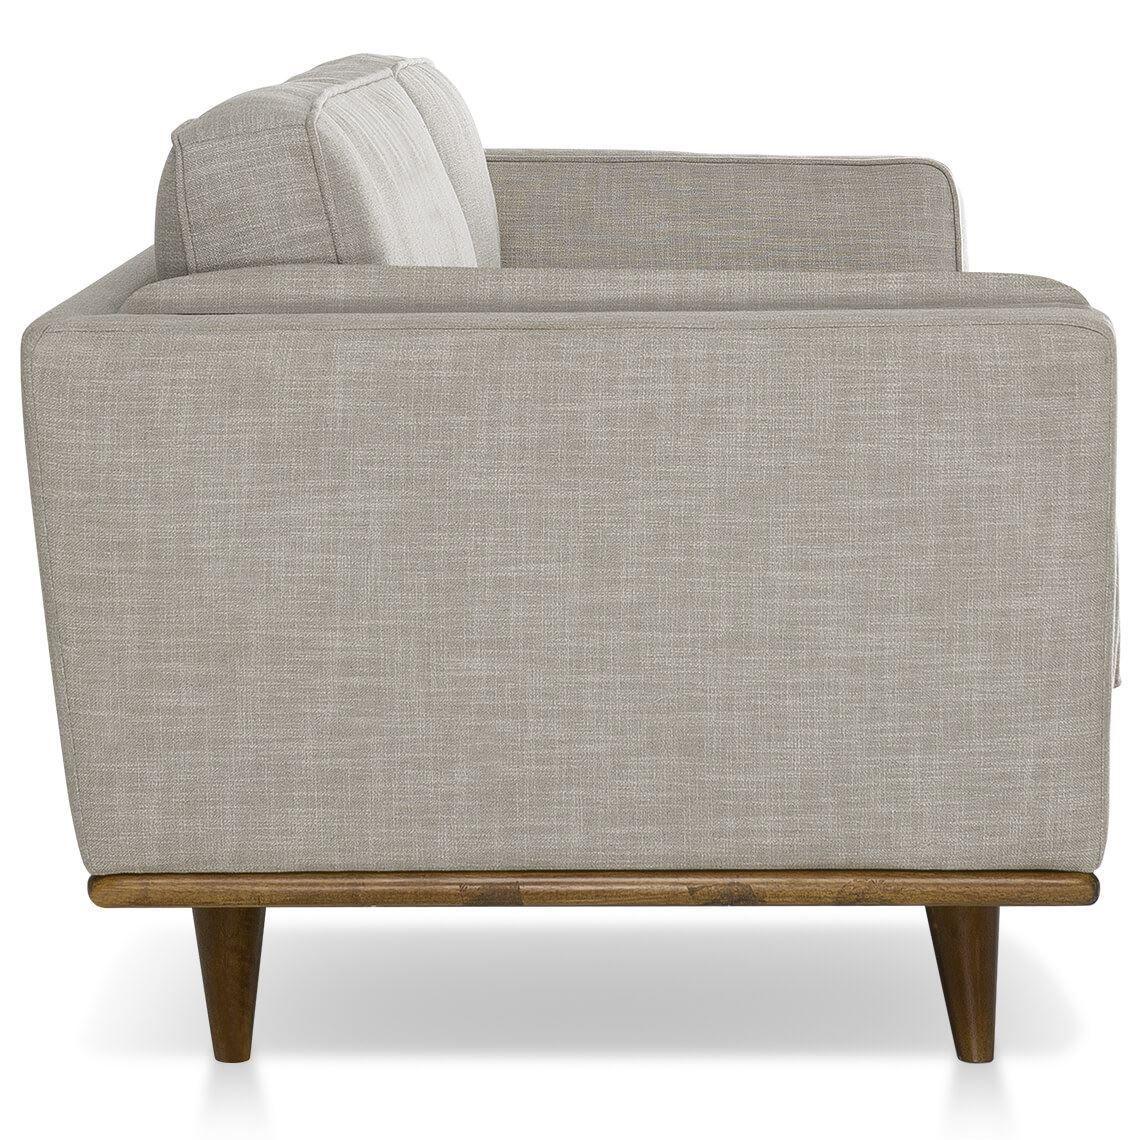 Dahlia 2 5 Seat Fabric Sofa Size W 197cm X D 93cm X H 80cm In Shell 90 Polyester 10 Linen Woven Freedom In 2020 Fabric Sofa Elegant Sofa Freedom Furniture